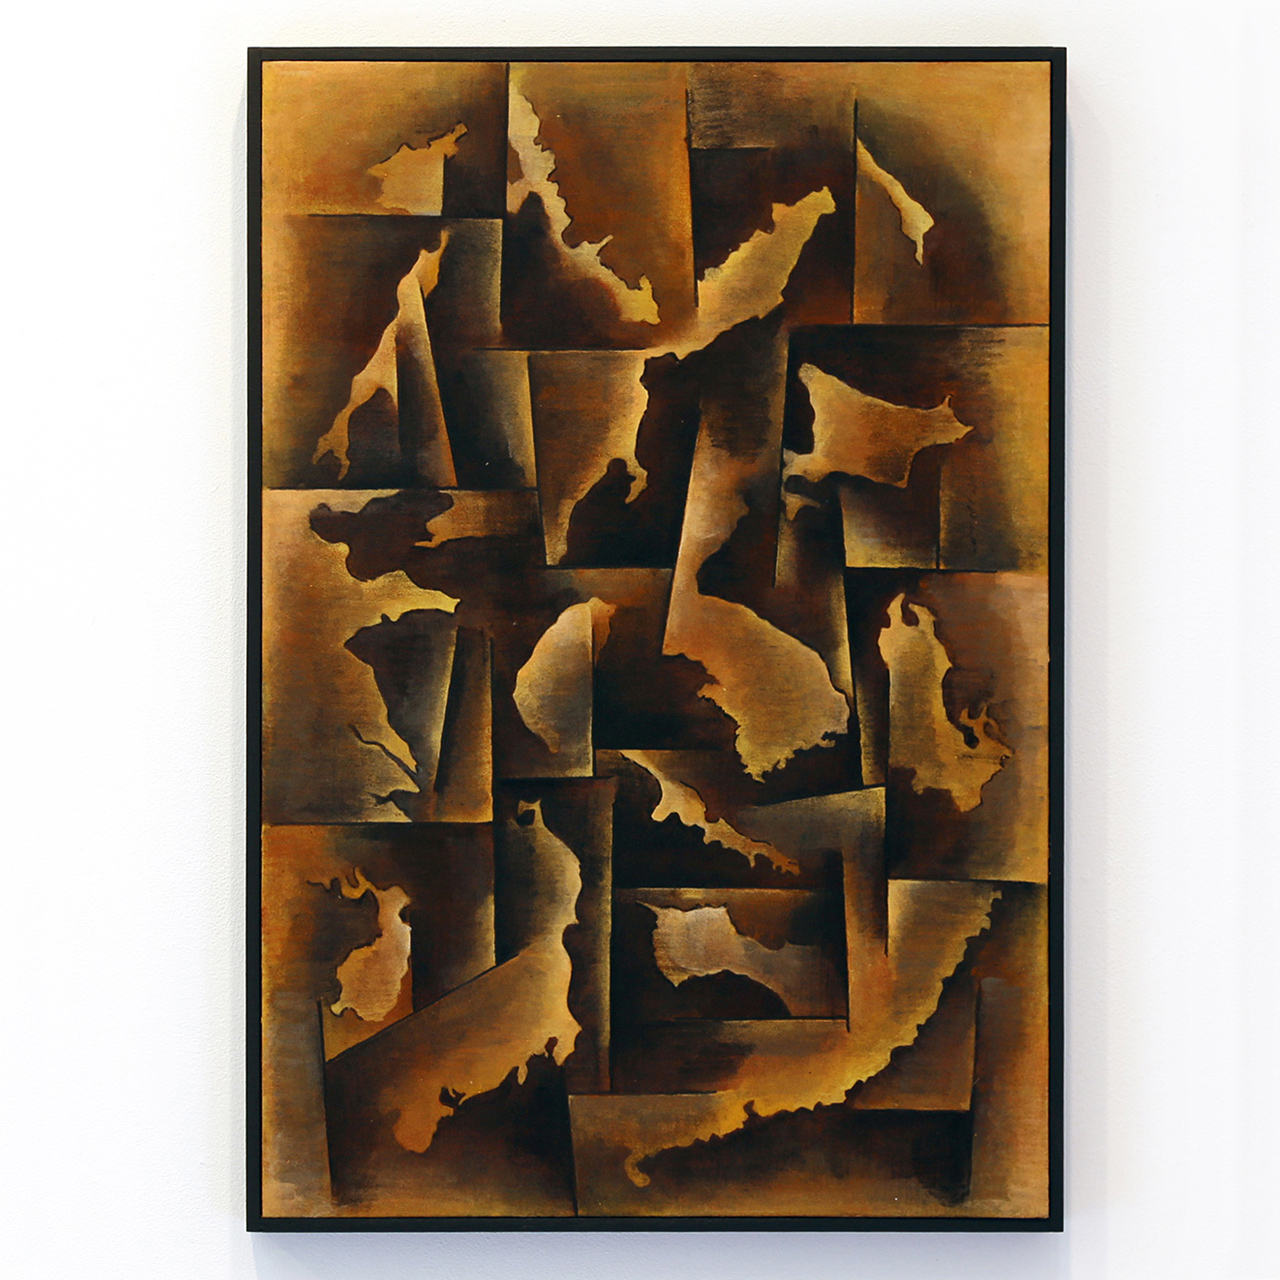 Cubism(East Asia)